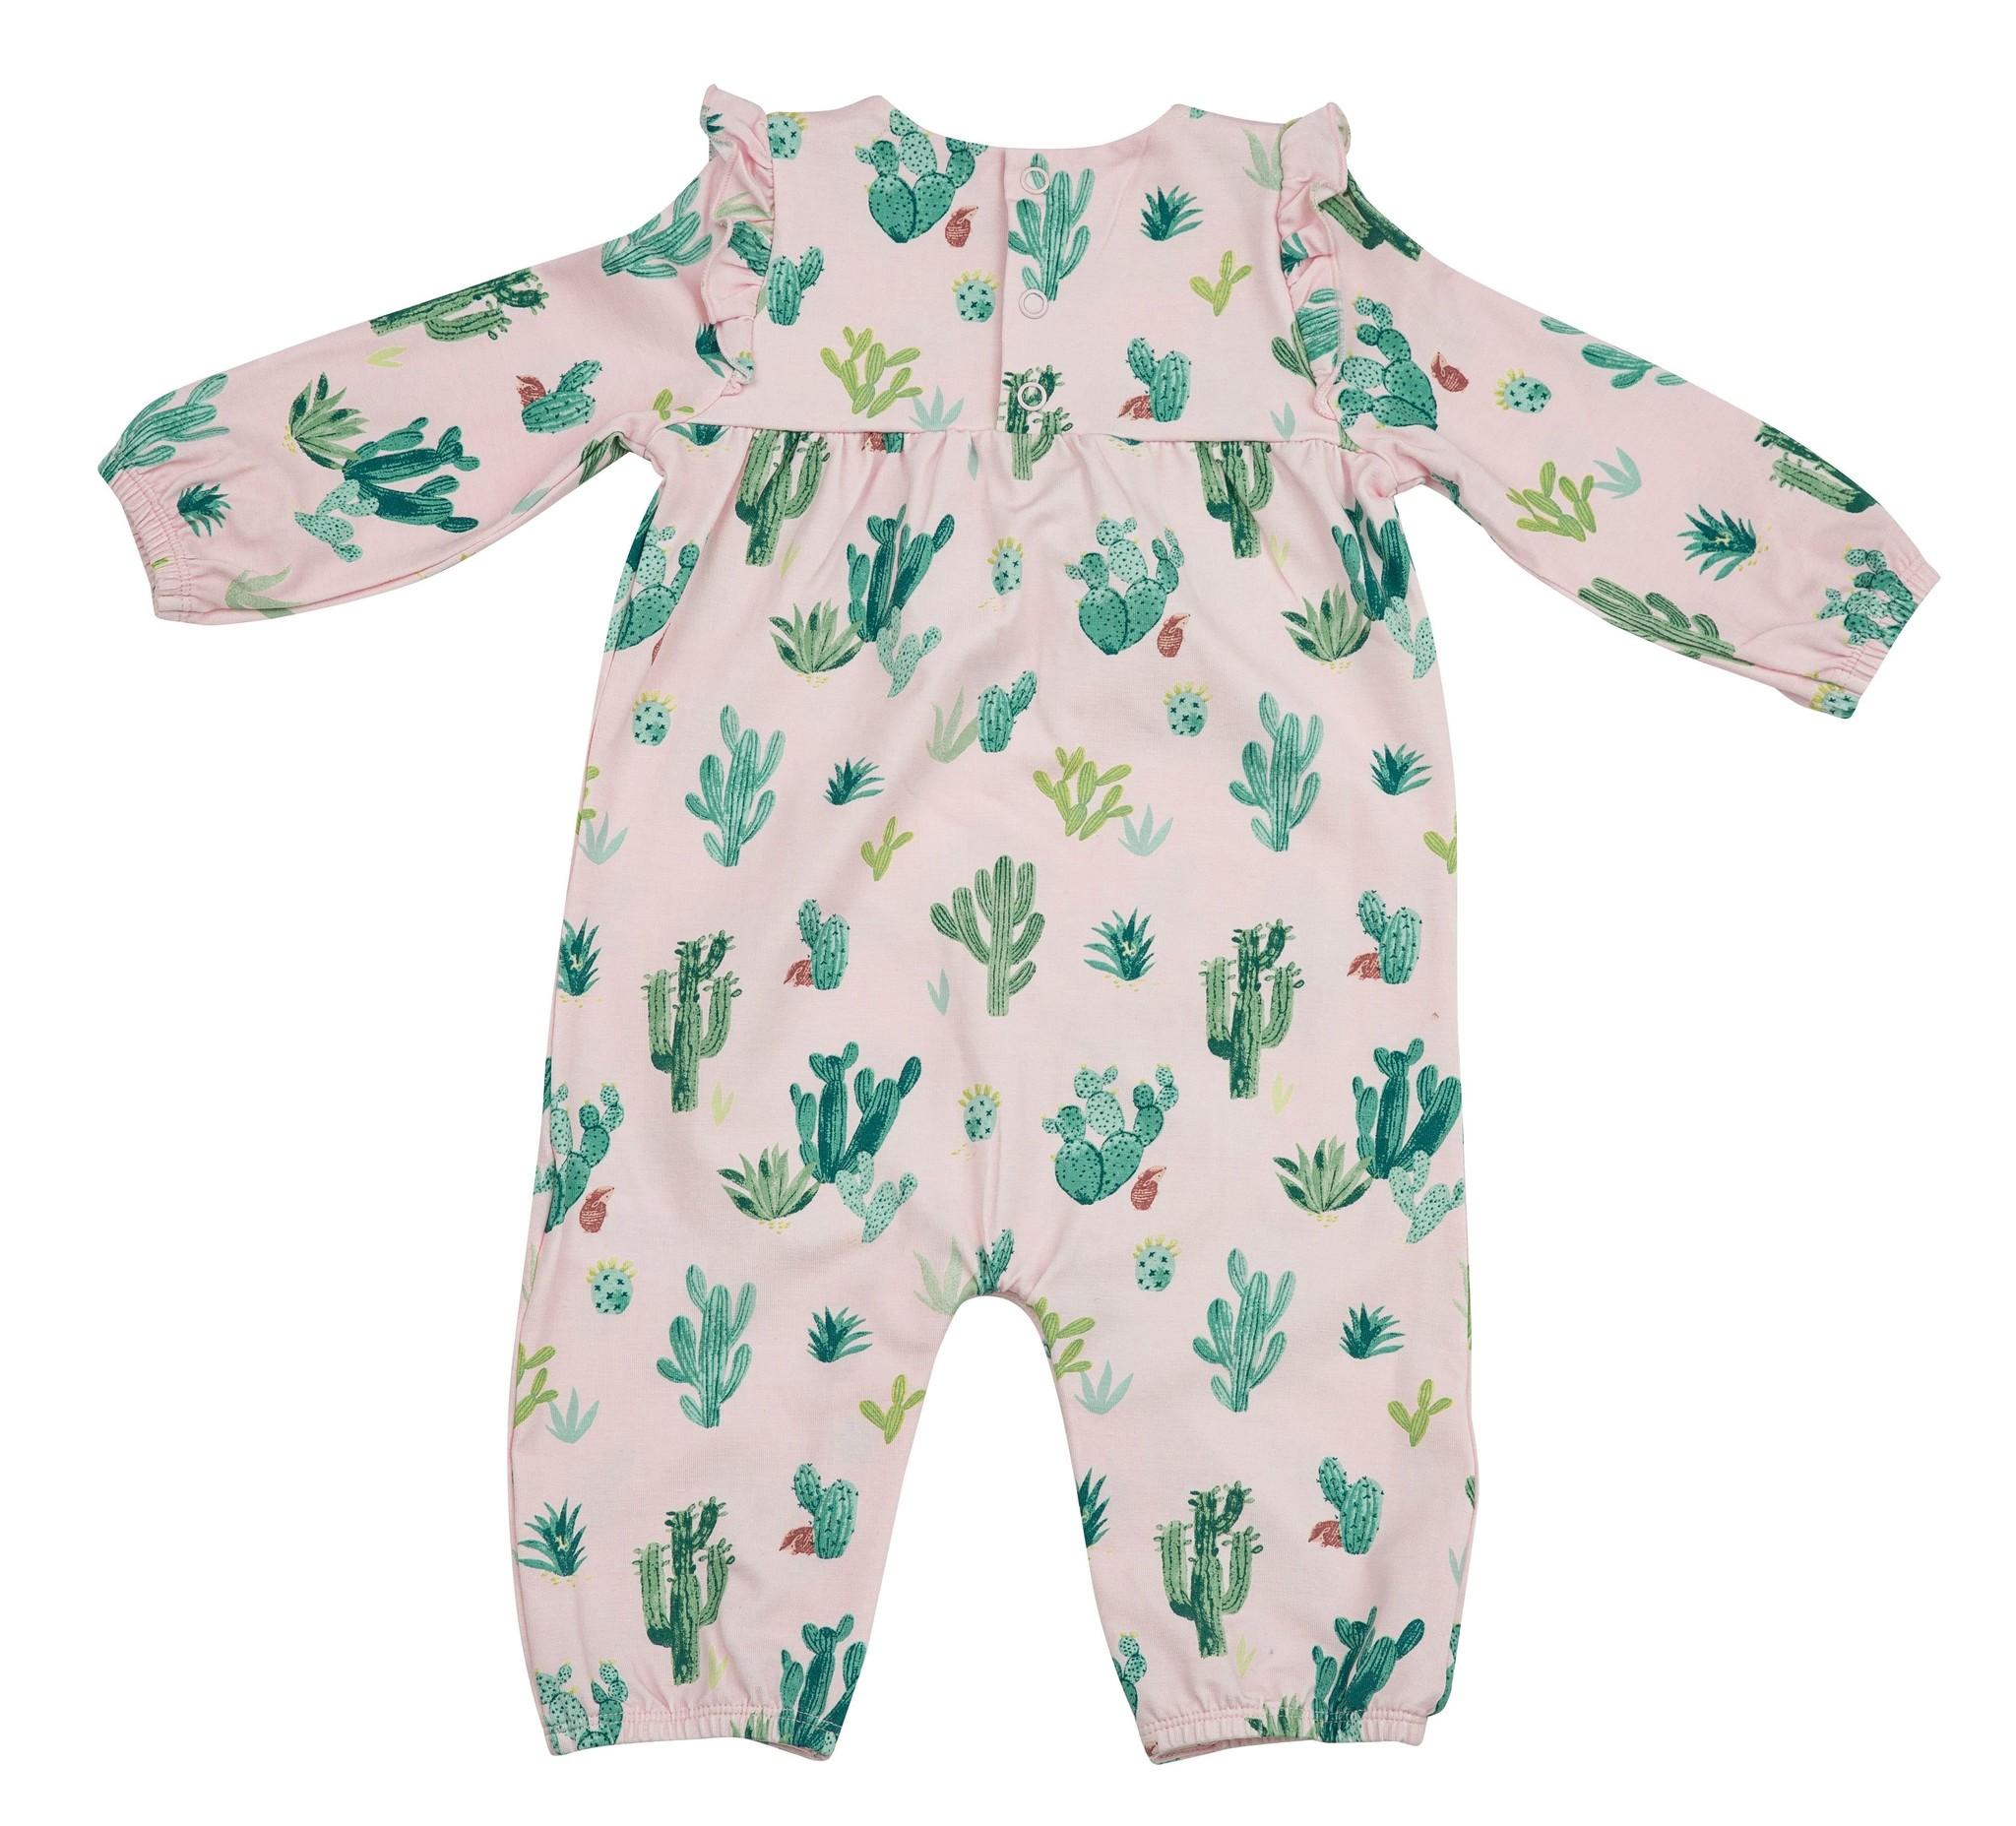 Angel Dear Cactus Ruffle Sleeve Romper - Pink